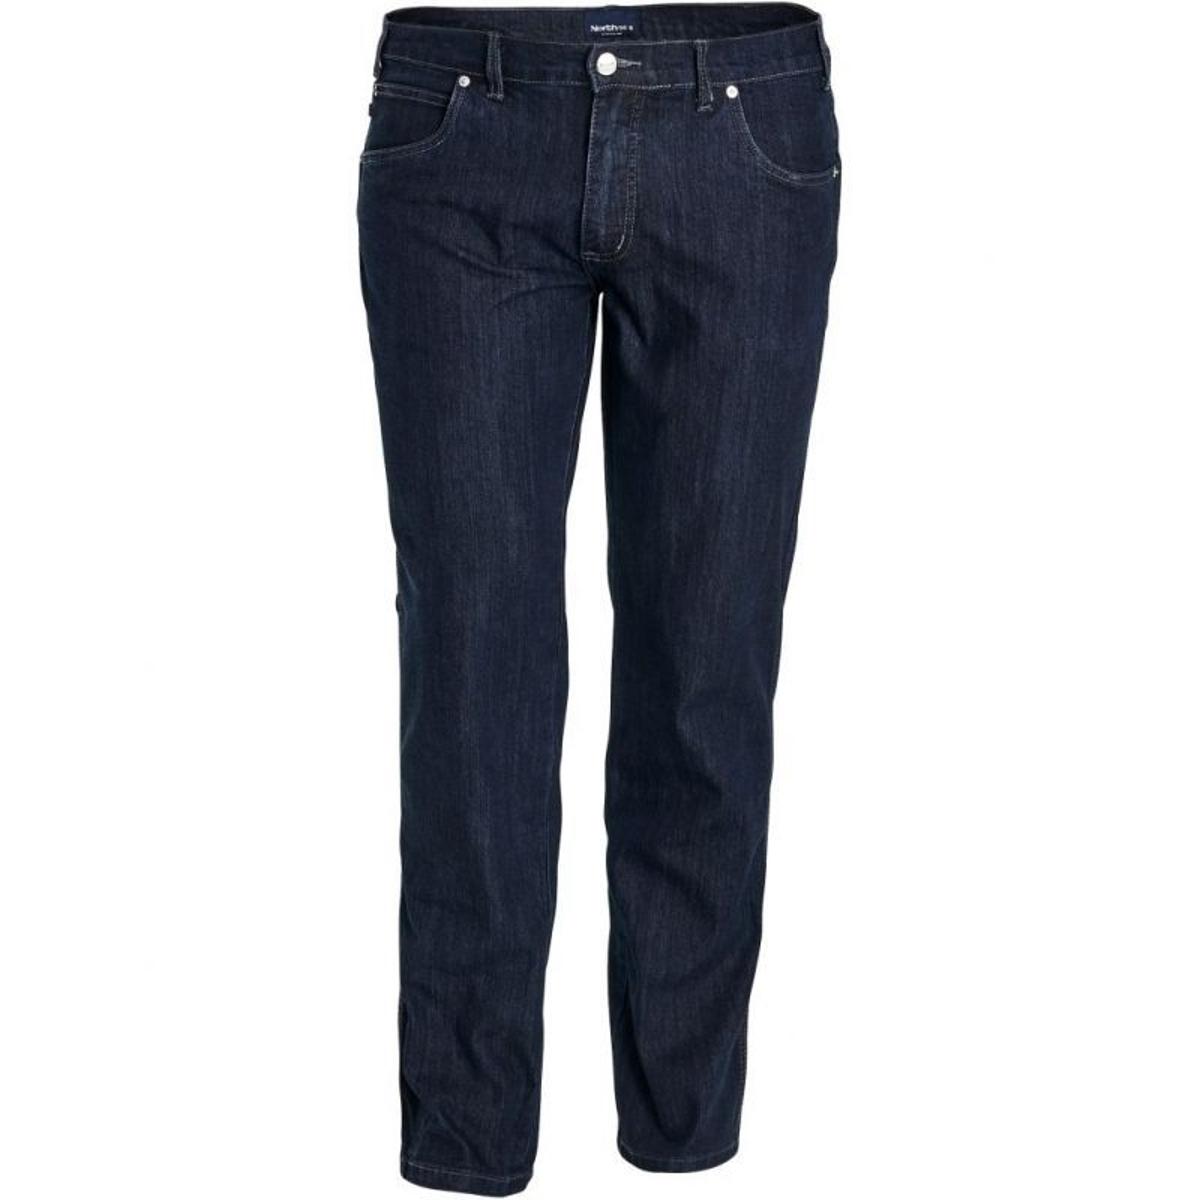 Jeans stretch north noir